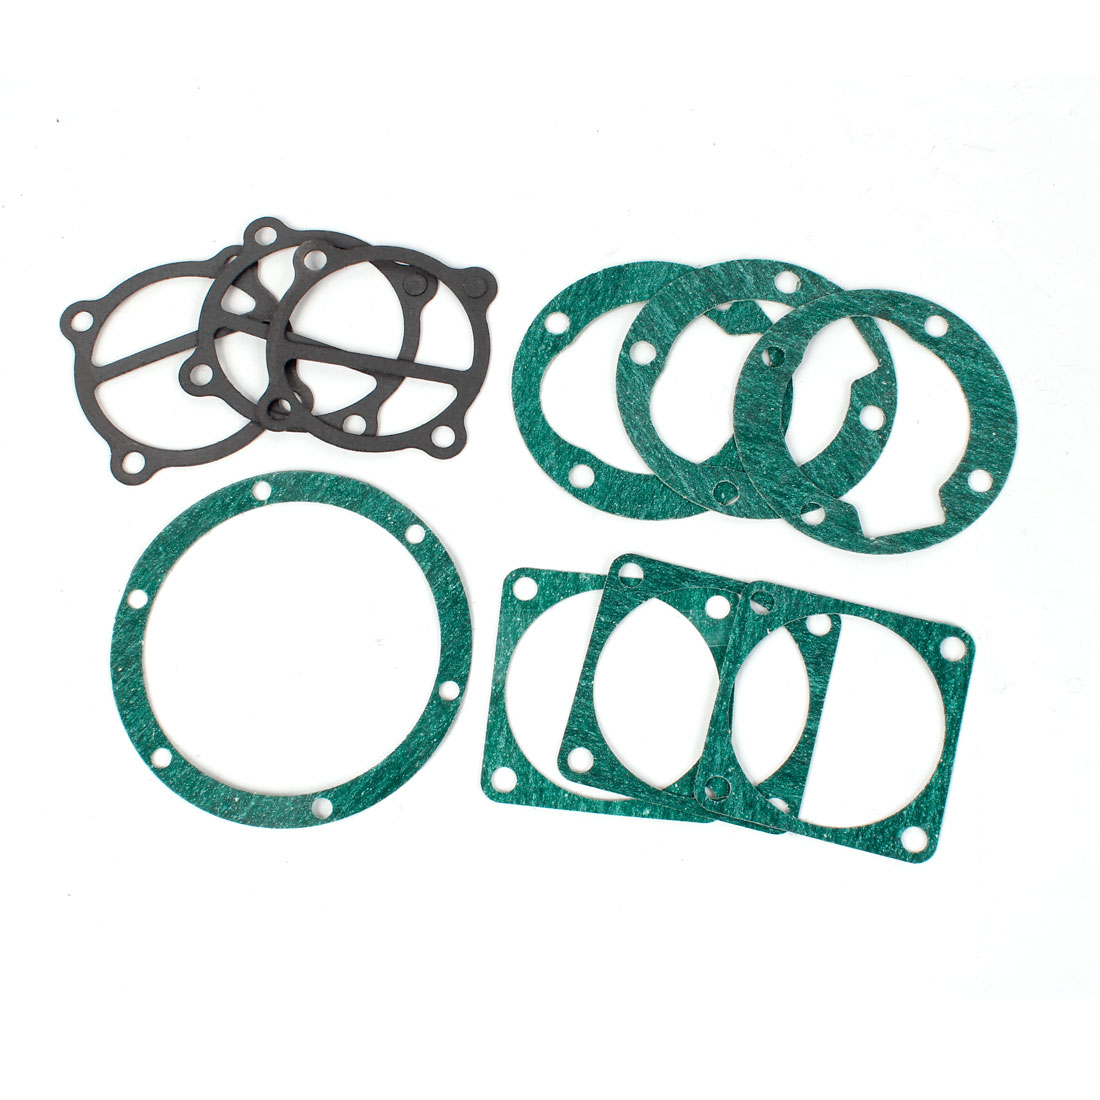 10 in 1 Industrial Air Compressor Cylinder Base Head Gaskets